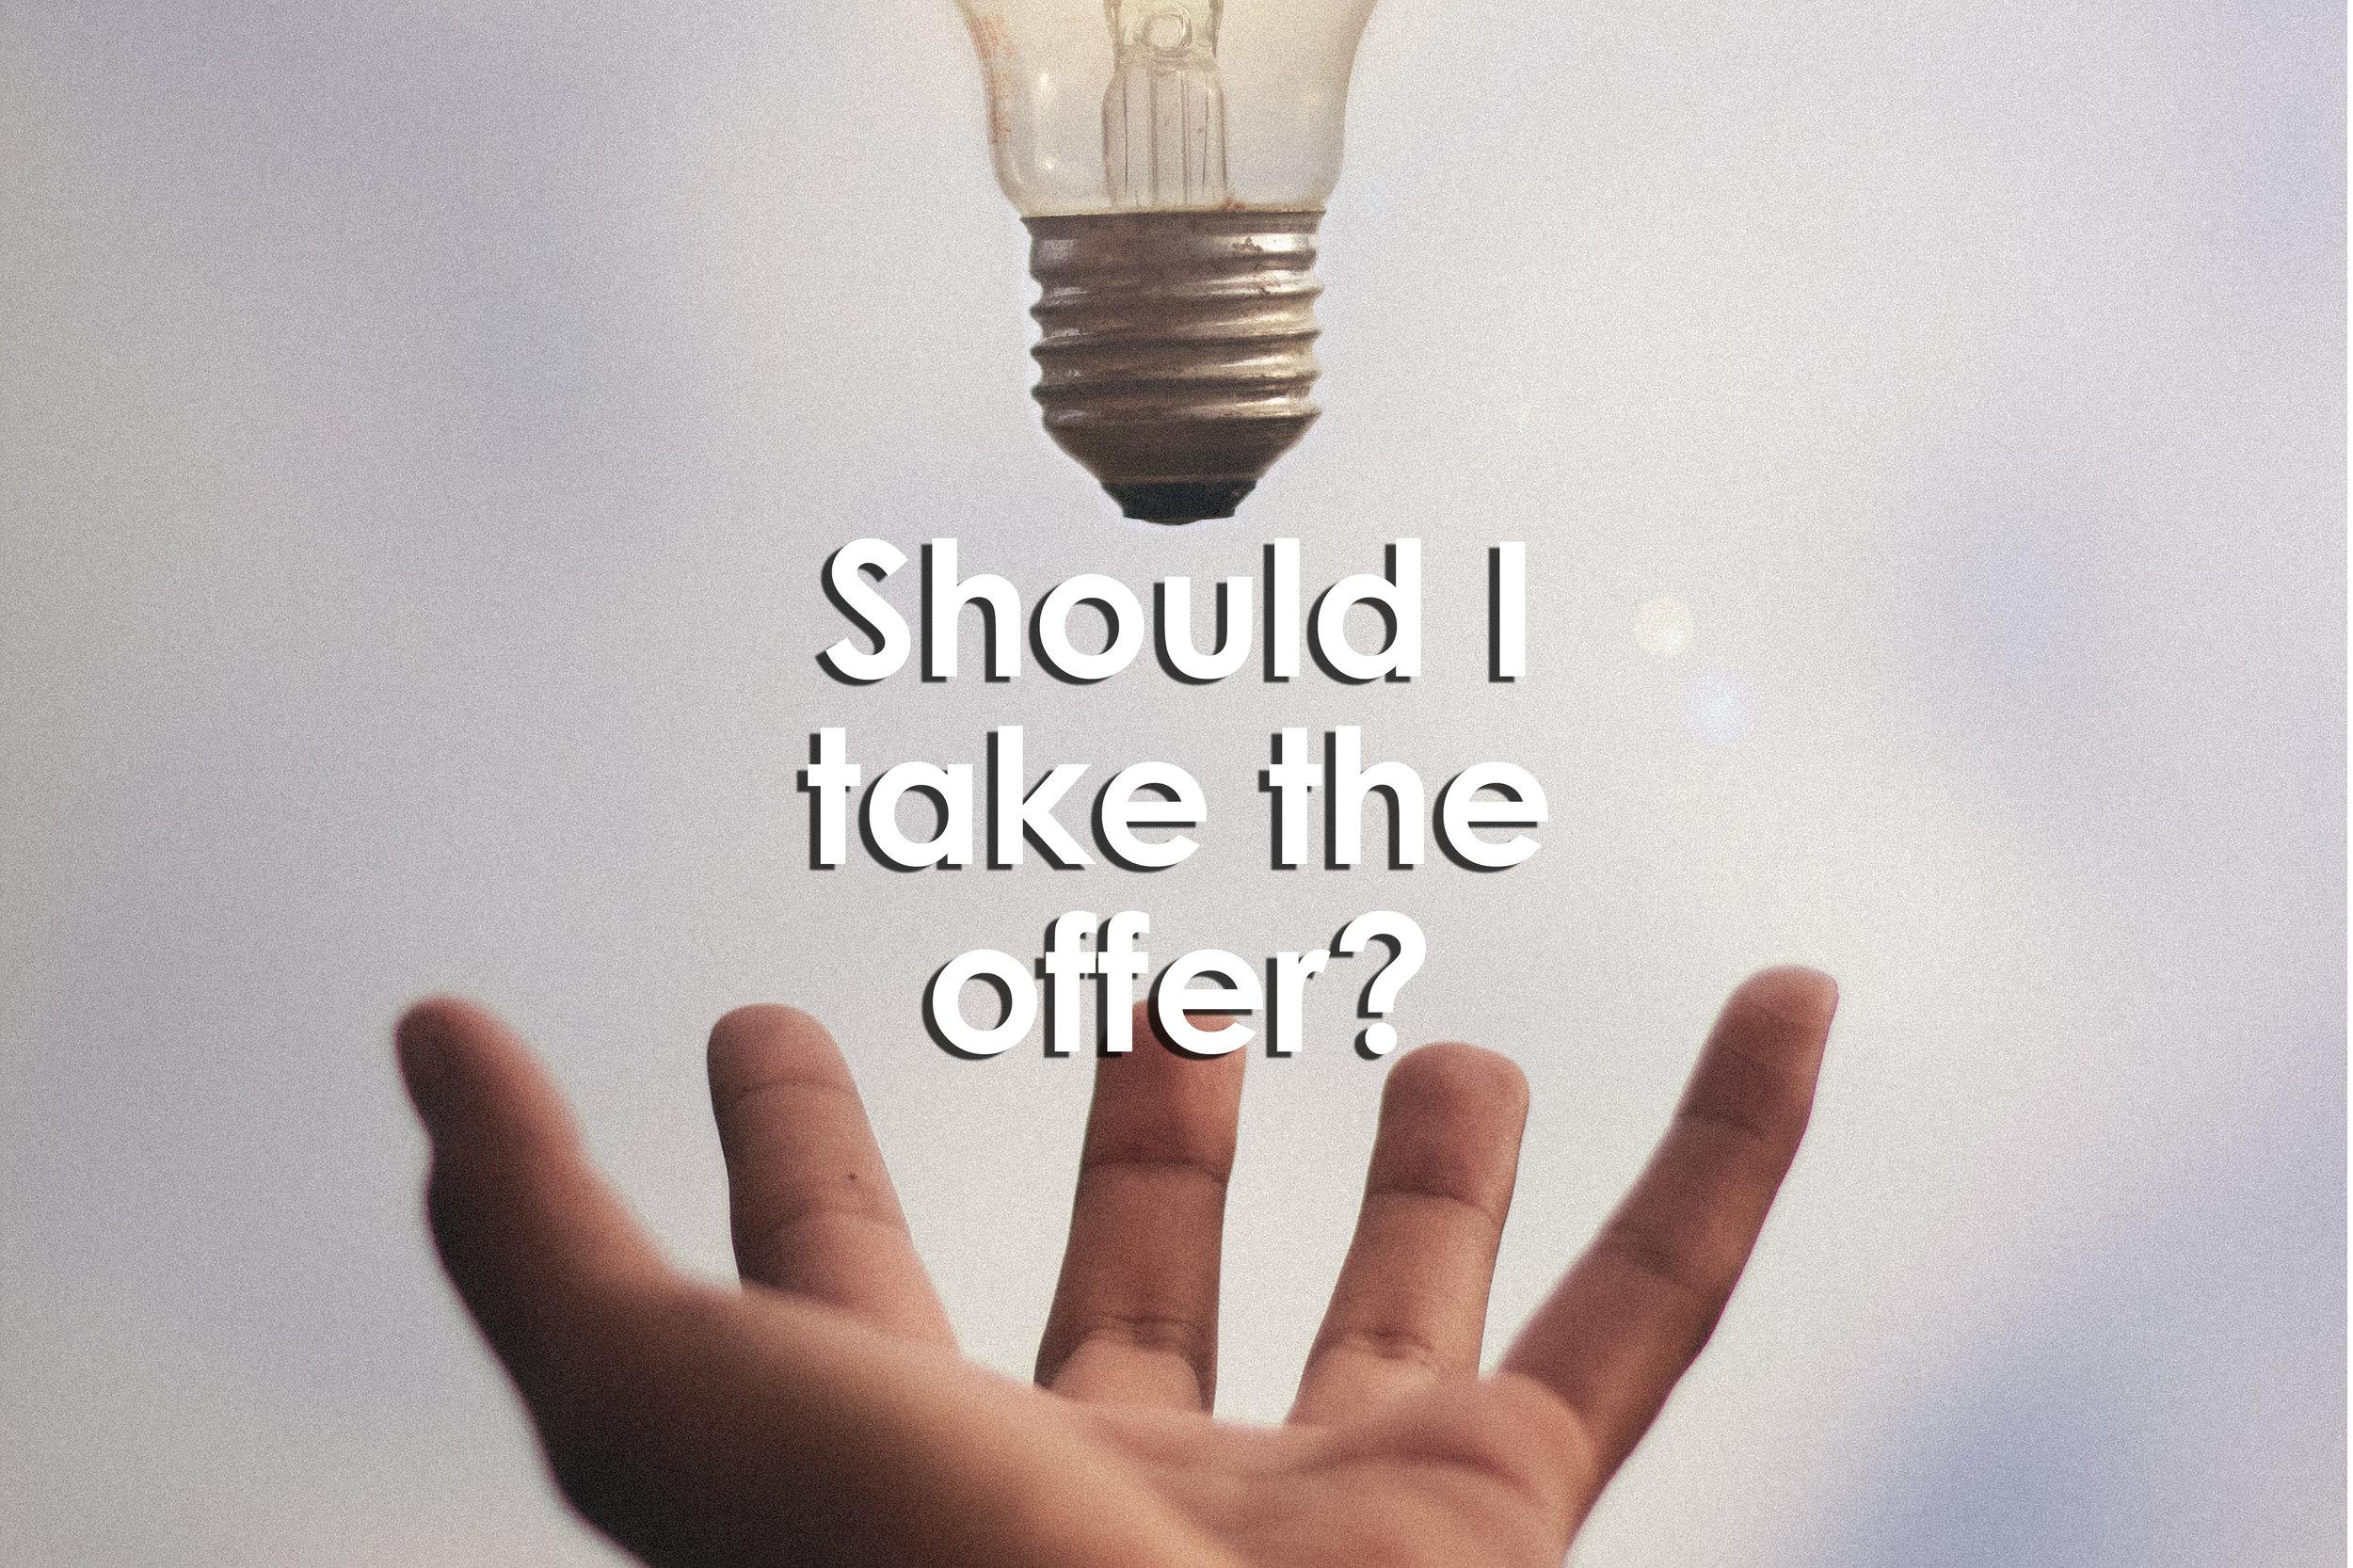 Should I take the offer?